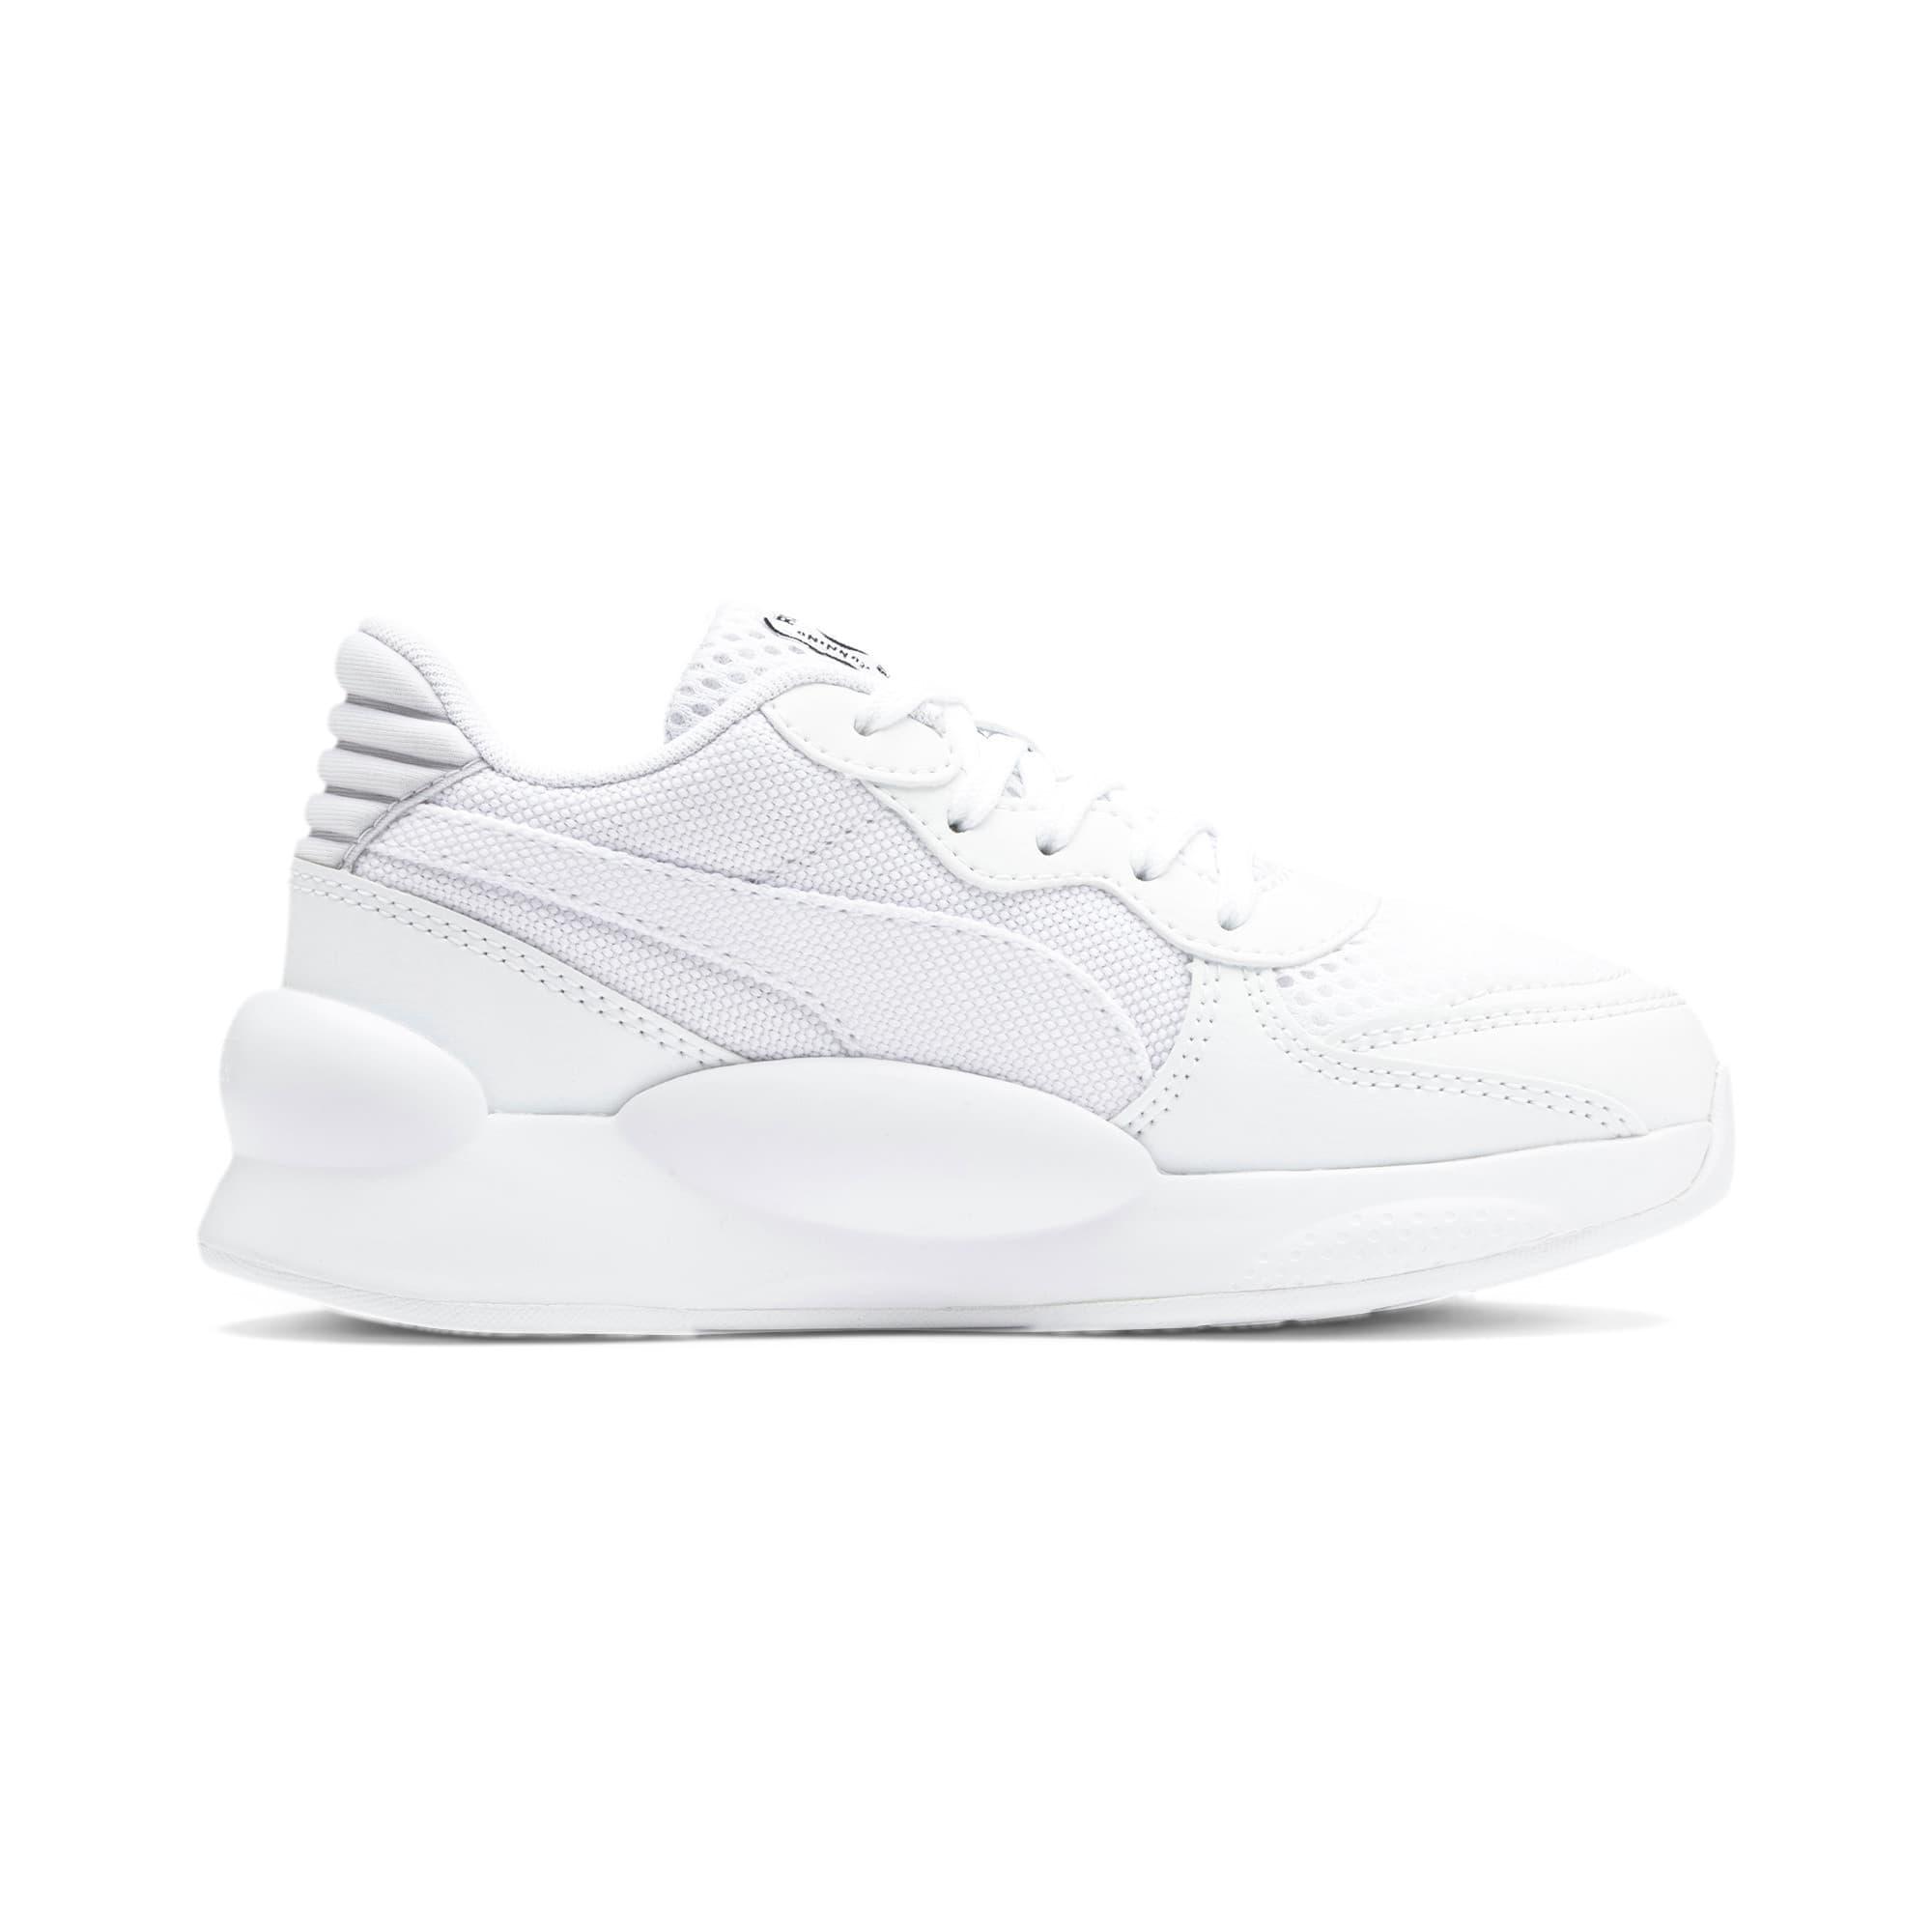 Thumbnail 5 of RS 9.8 Core Little Kids' Shoes, Puma White, medium